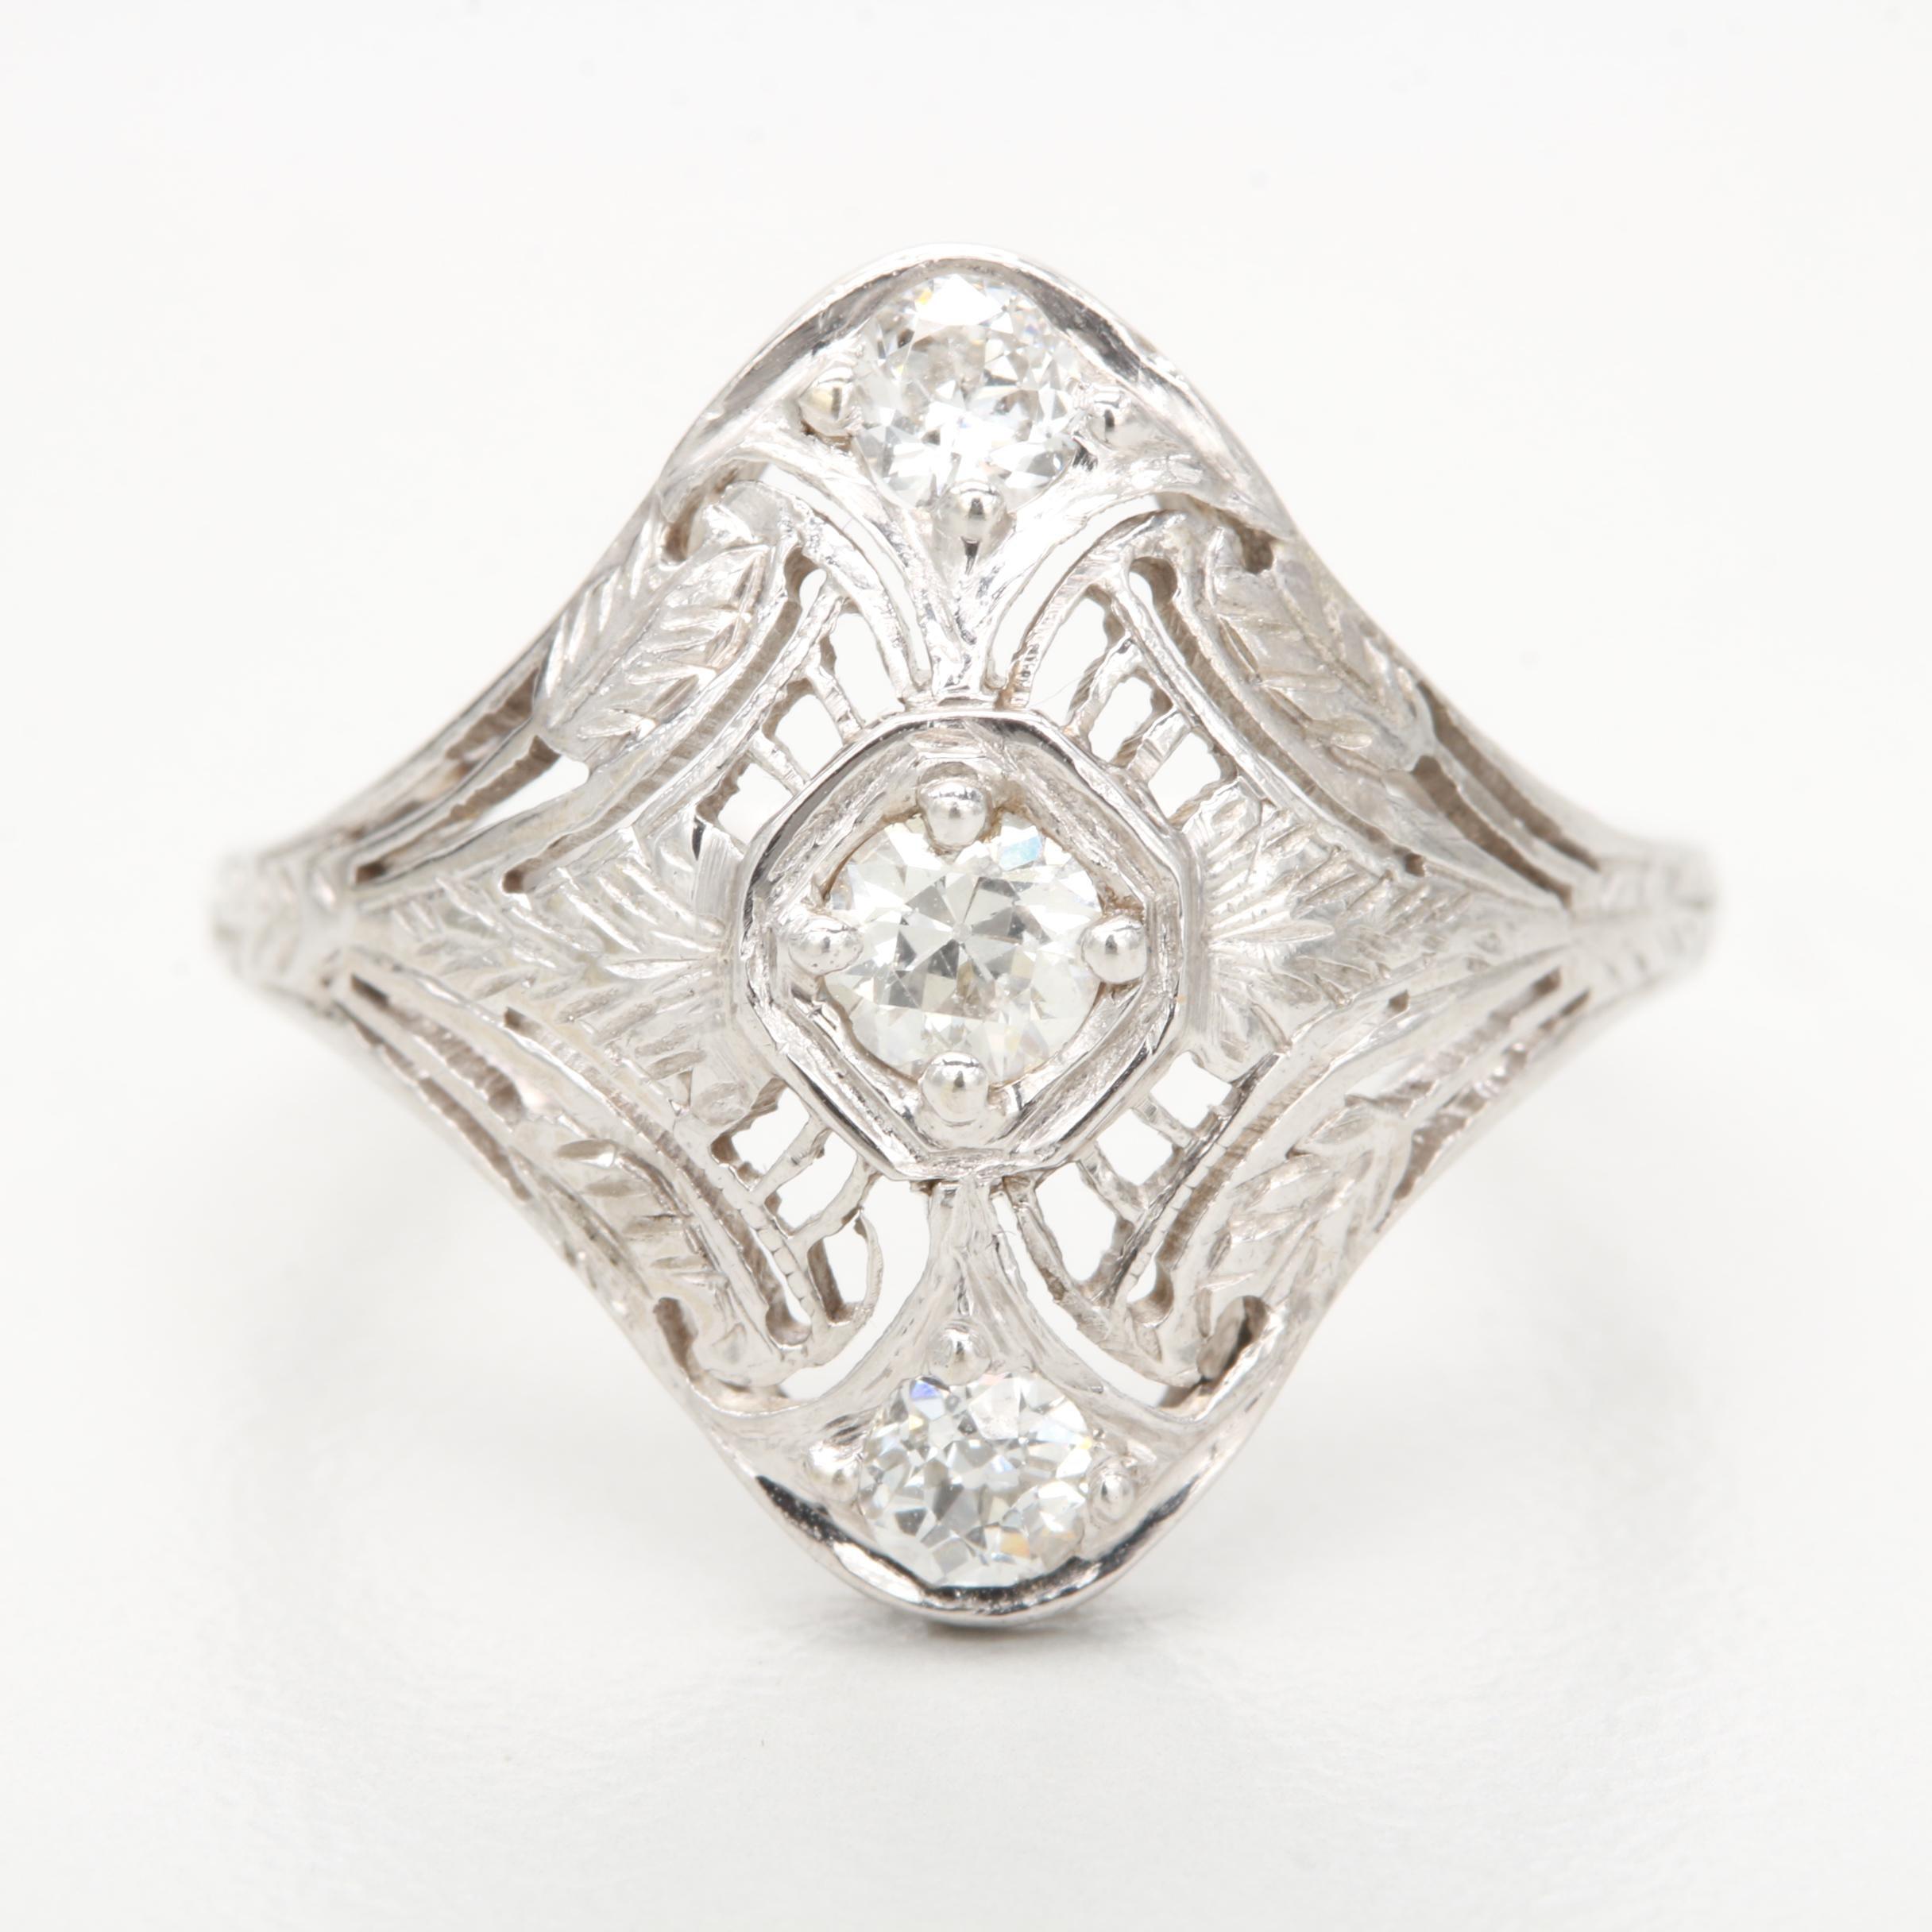 Edwardian 14K White Gold Old European Cut Diamond Ring